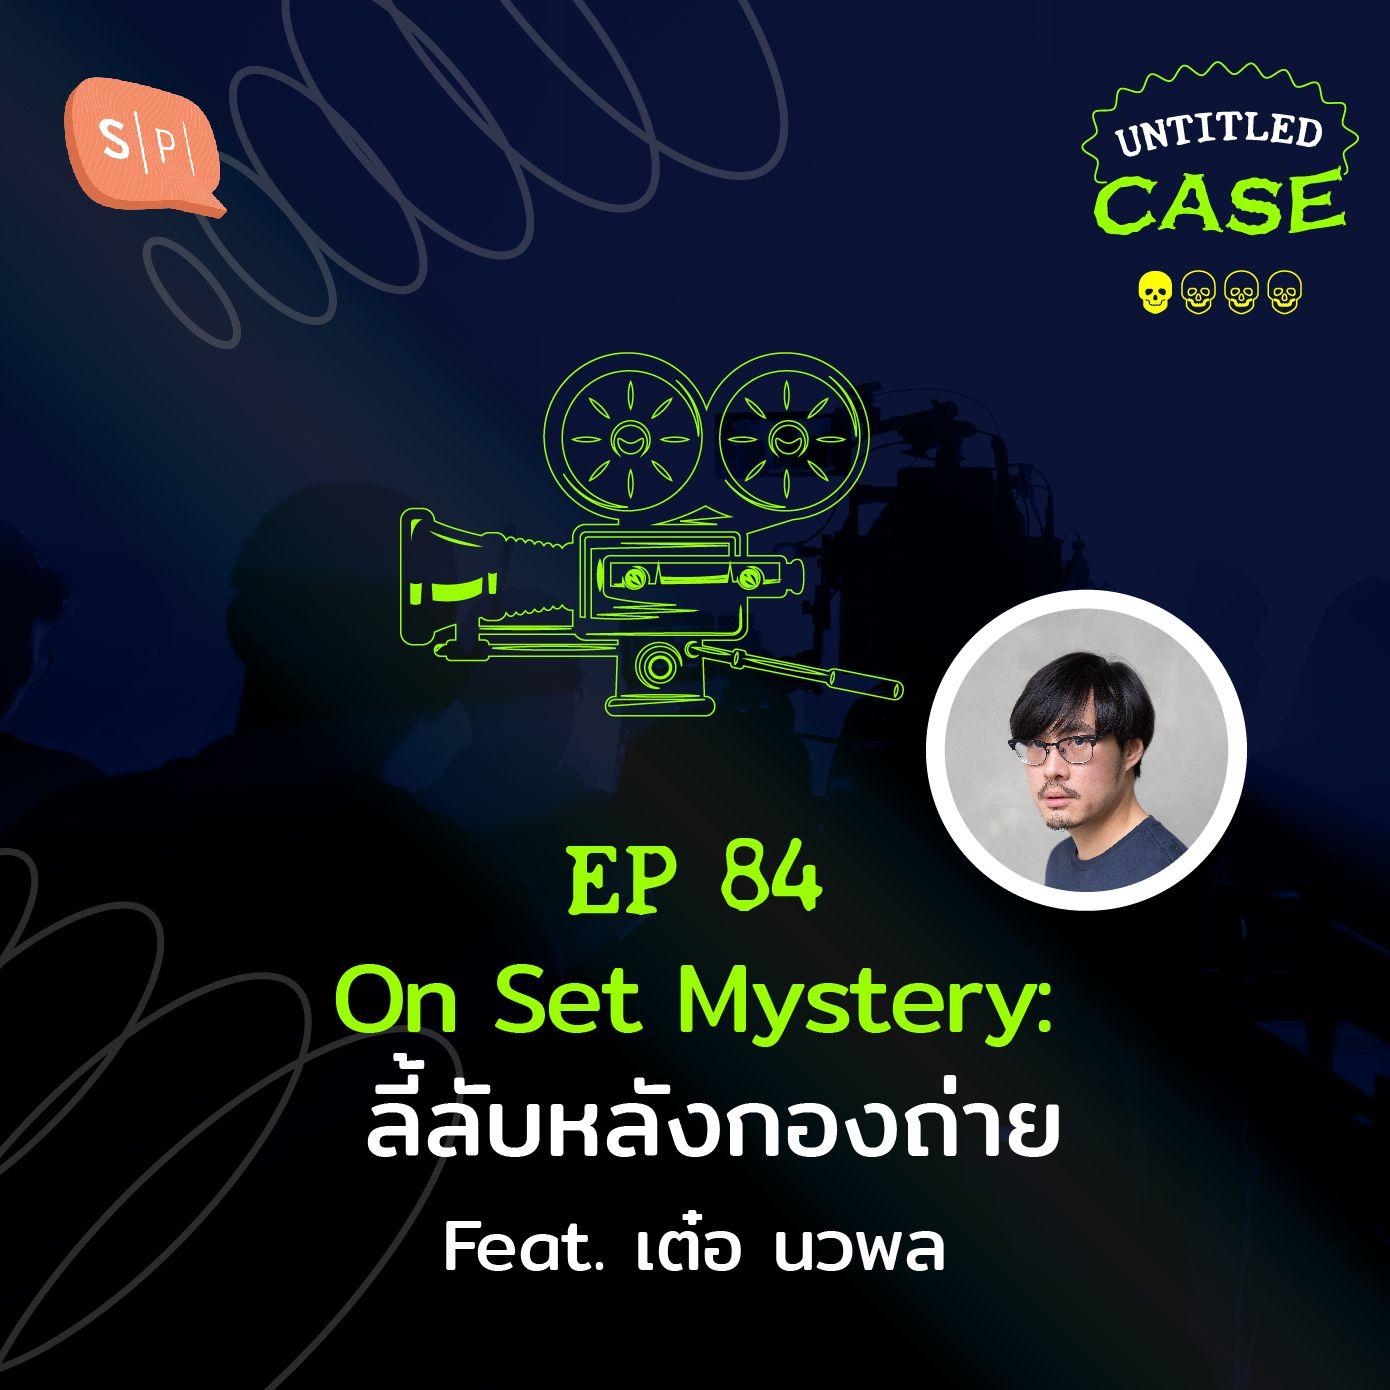 On Set Mystery: ลี้ลับหลังกองถ่าย Feat. เต๋อ นวพล | Untitled Case EP84